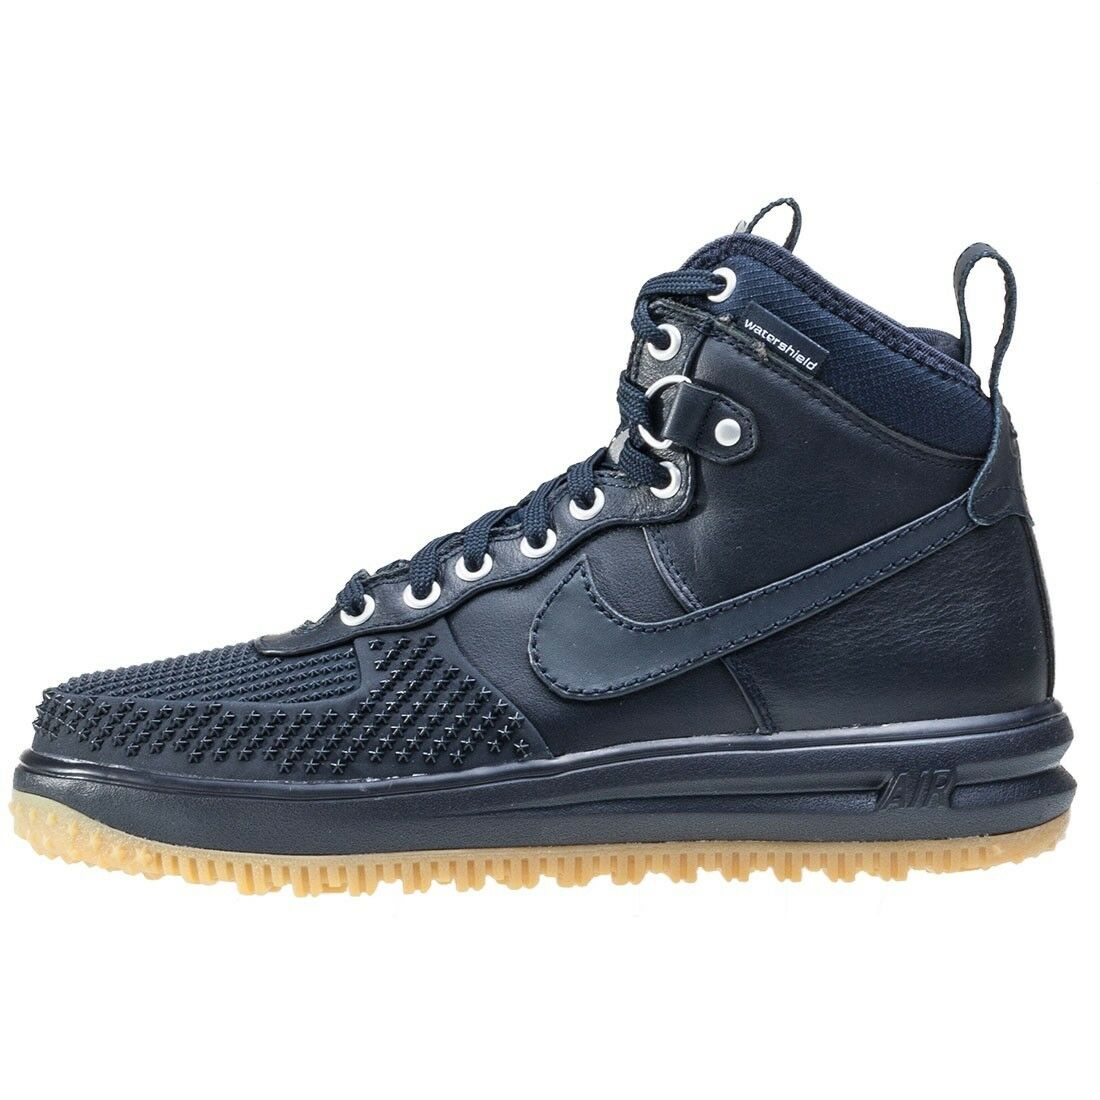 Nike Lunar Air Force 1 duckBotas azul goma De inferior 805899Sz 8 Botas De goma Invierno dd185c